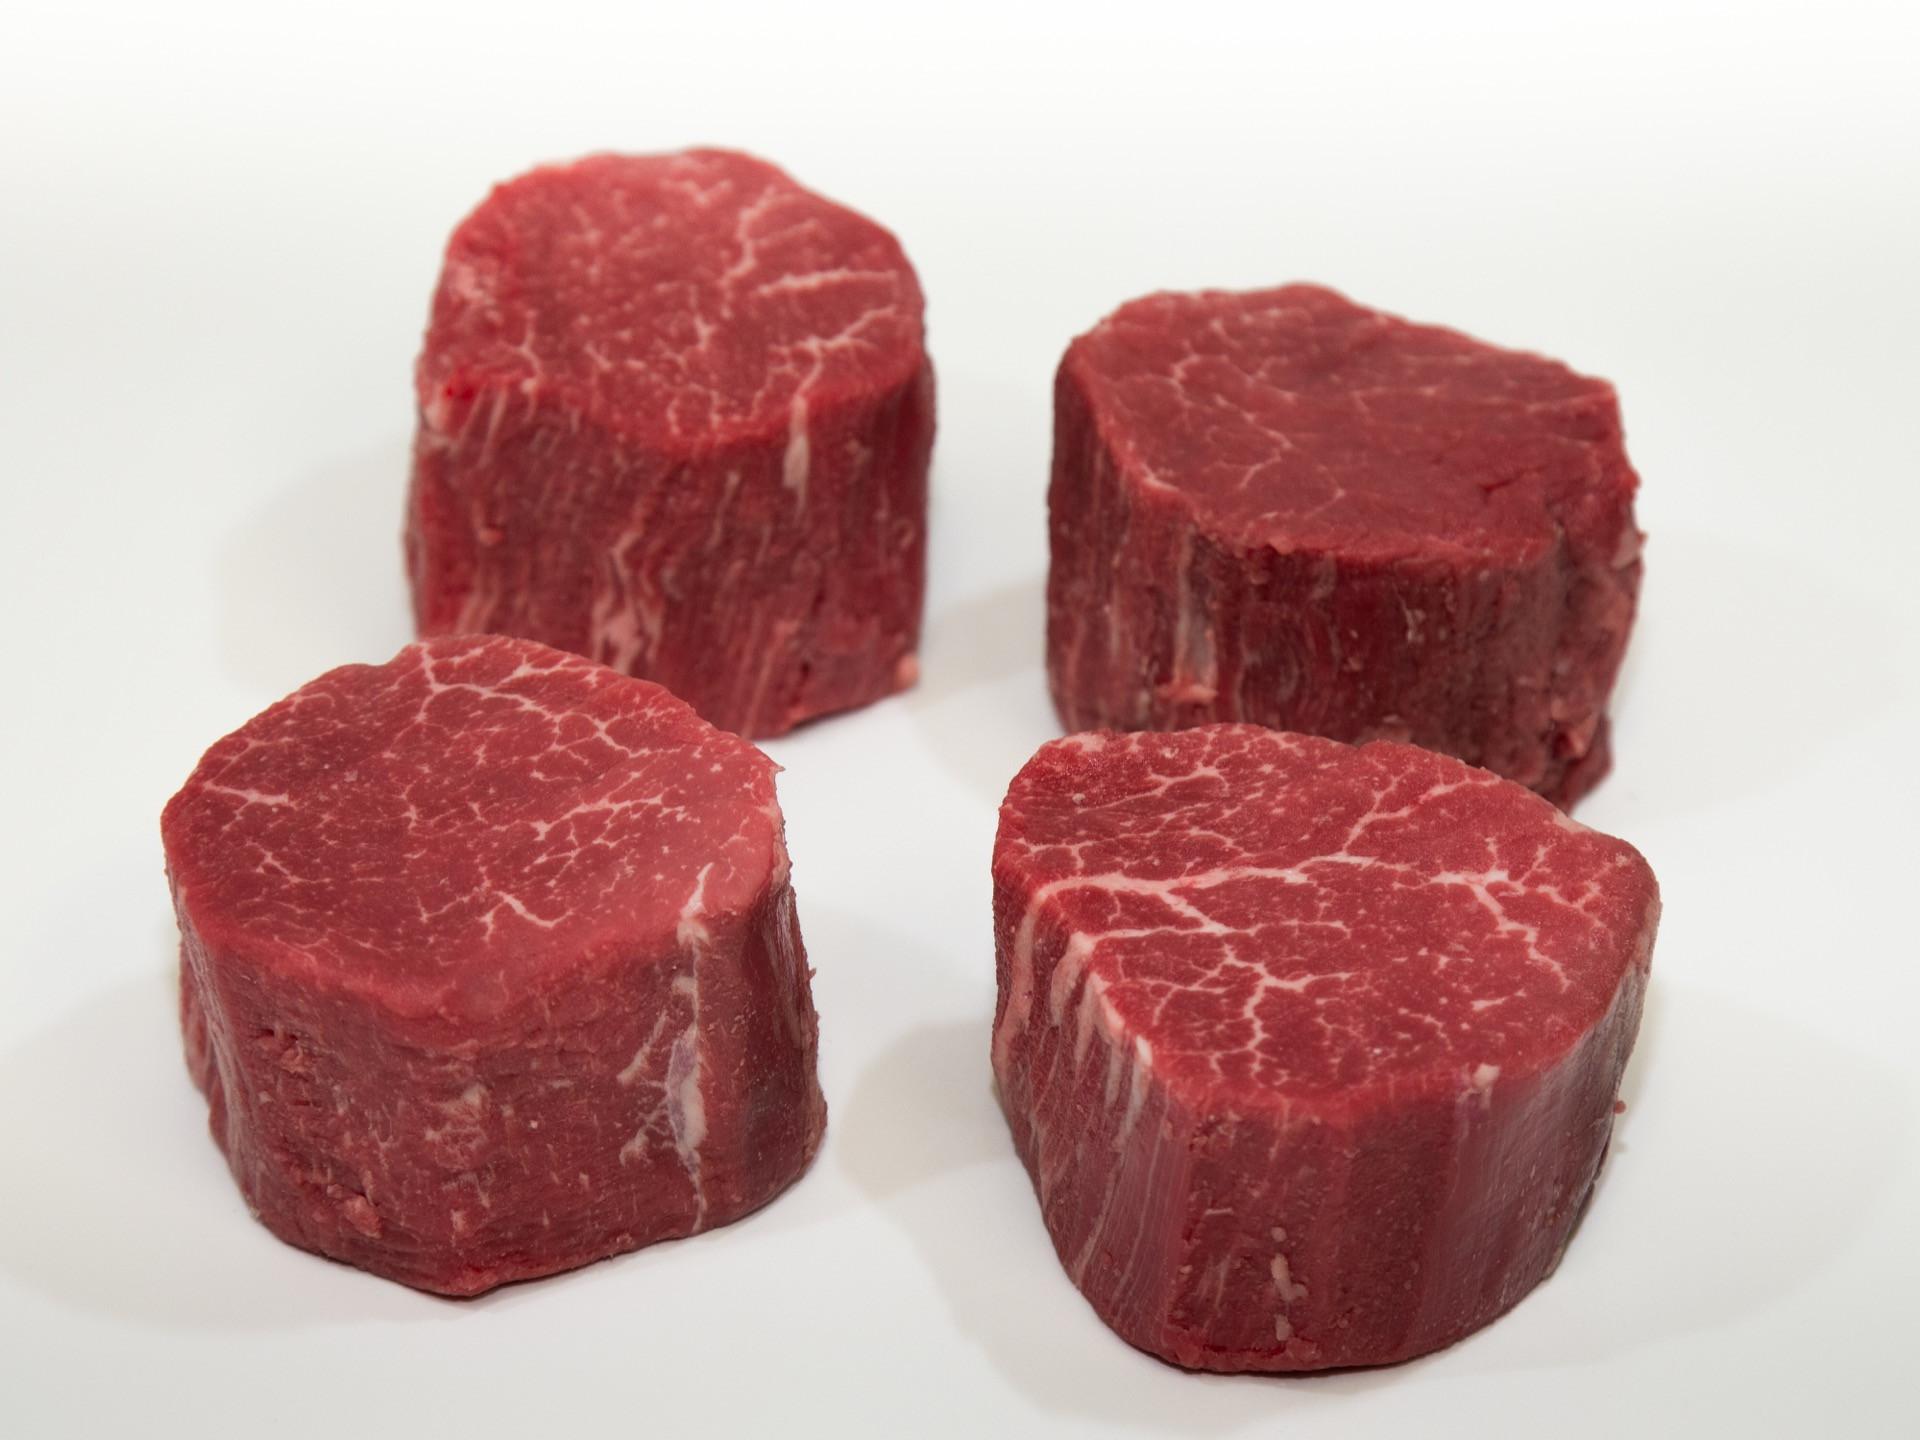 Beef Tenderloin Filet Mignon  Filet Mignon Steaks & Tenderloins Buy line Overnight